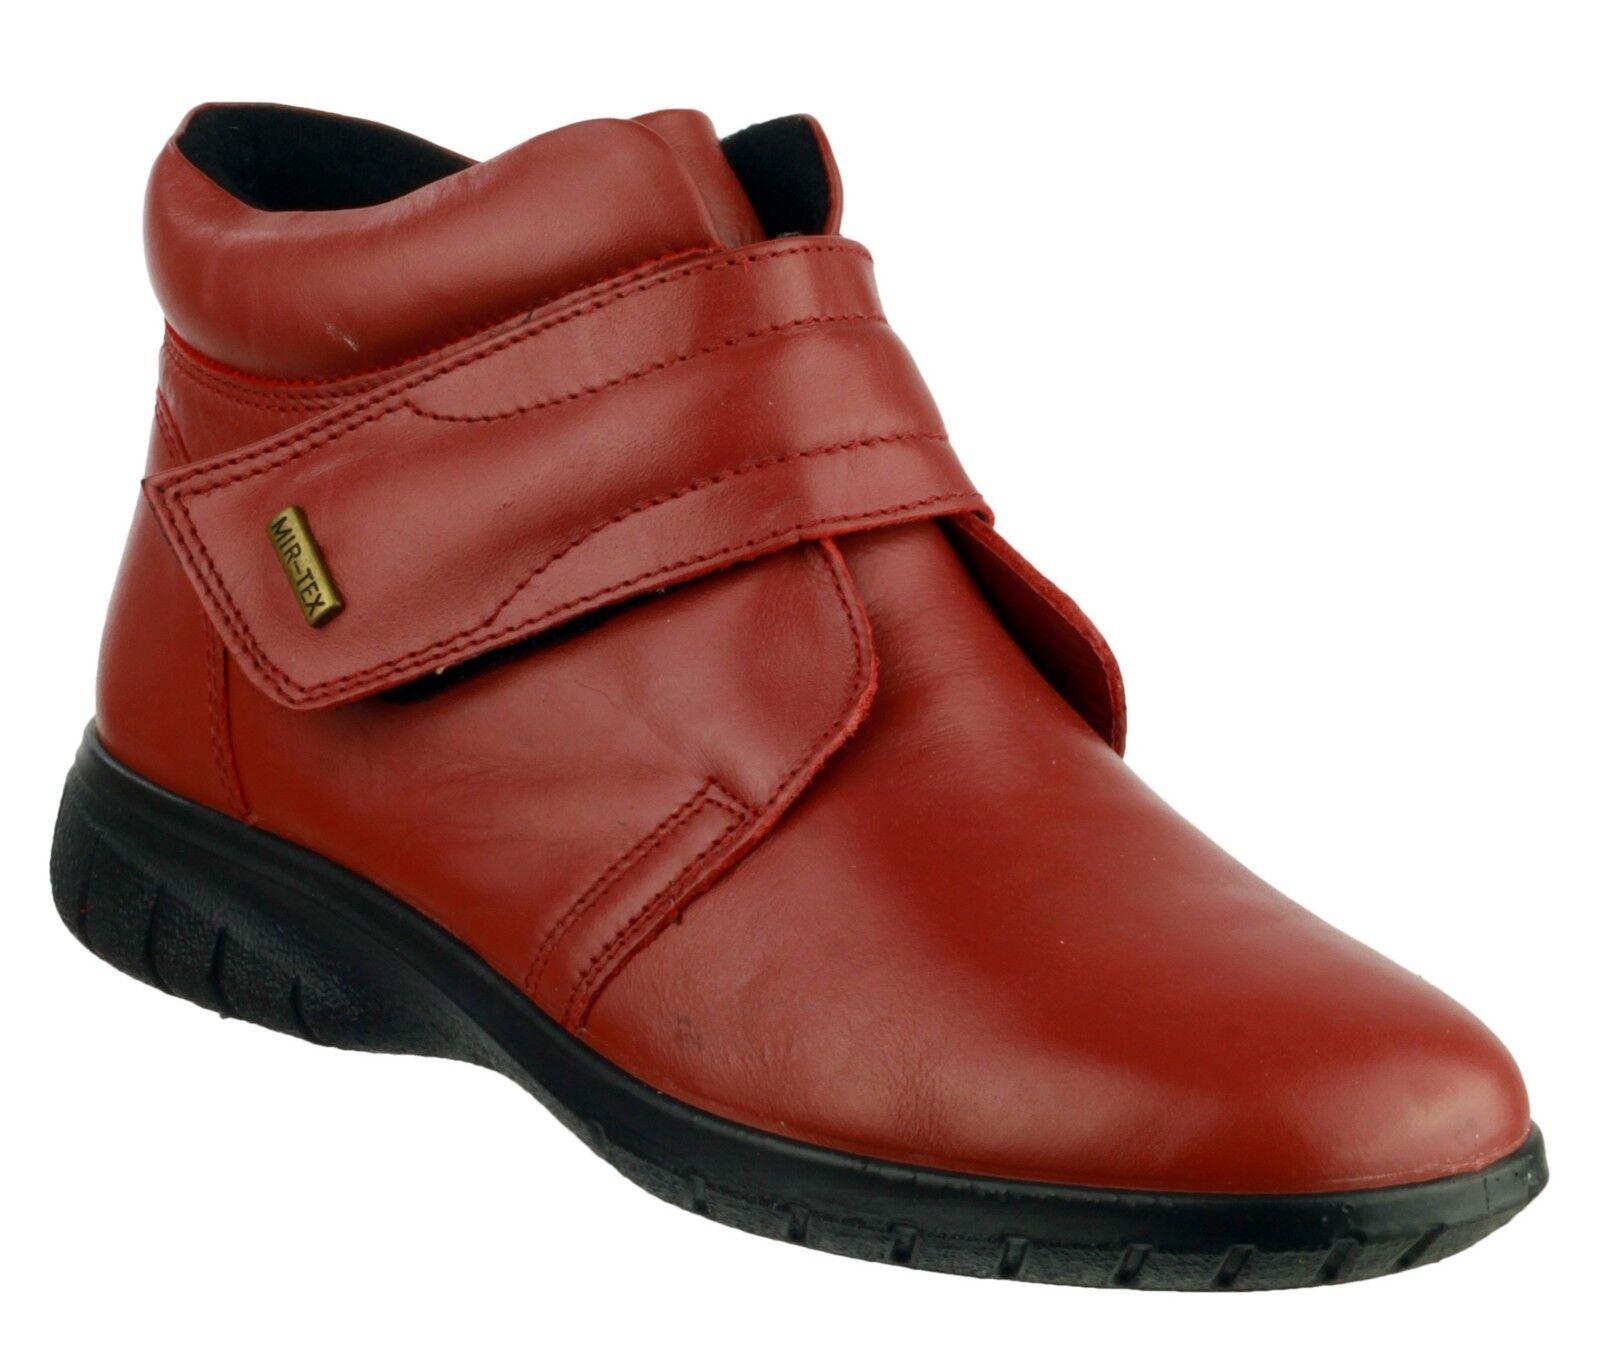 Cotswold Damenschuhe Leder Chalford Waterproof Touch Fastening Stiefel Style Chalford Leder C burgun 338281